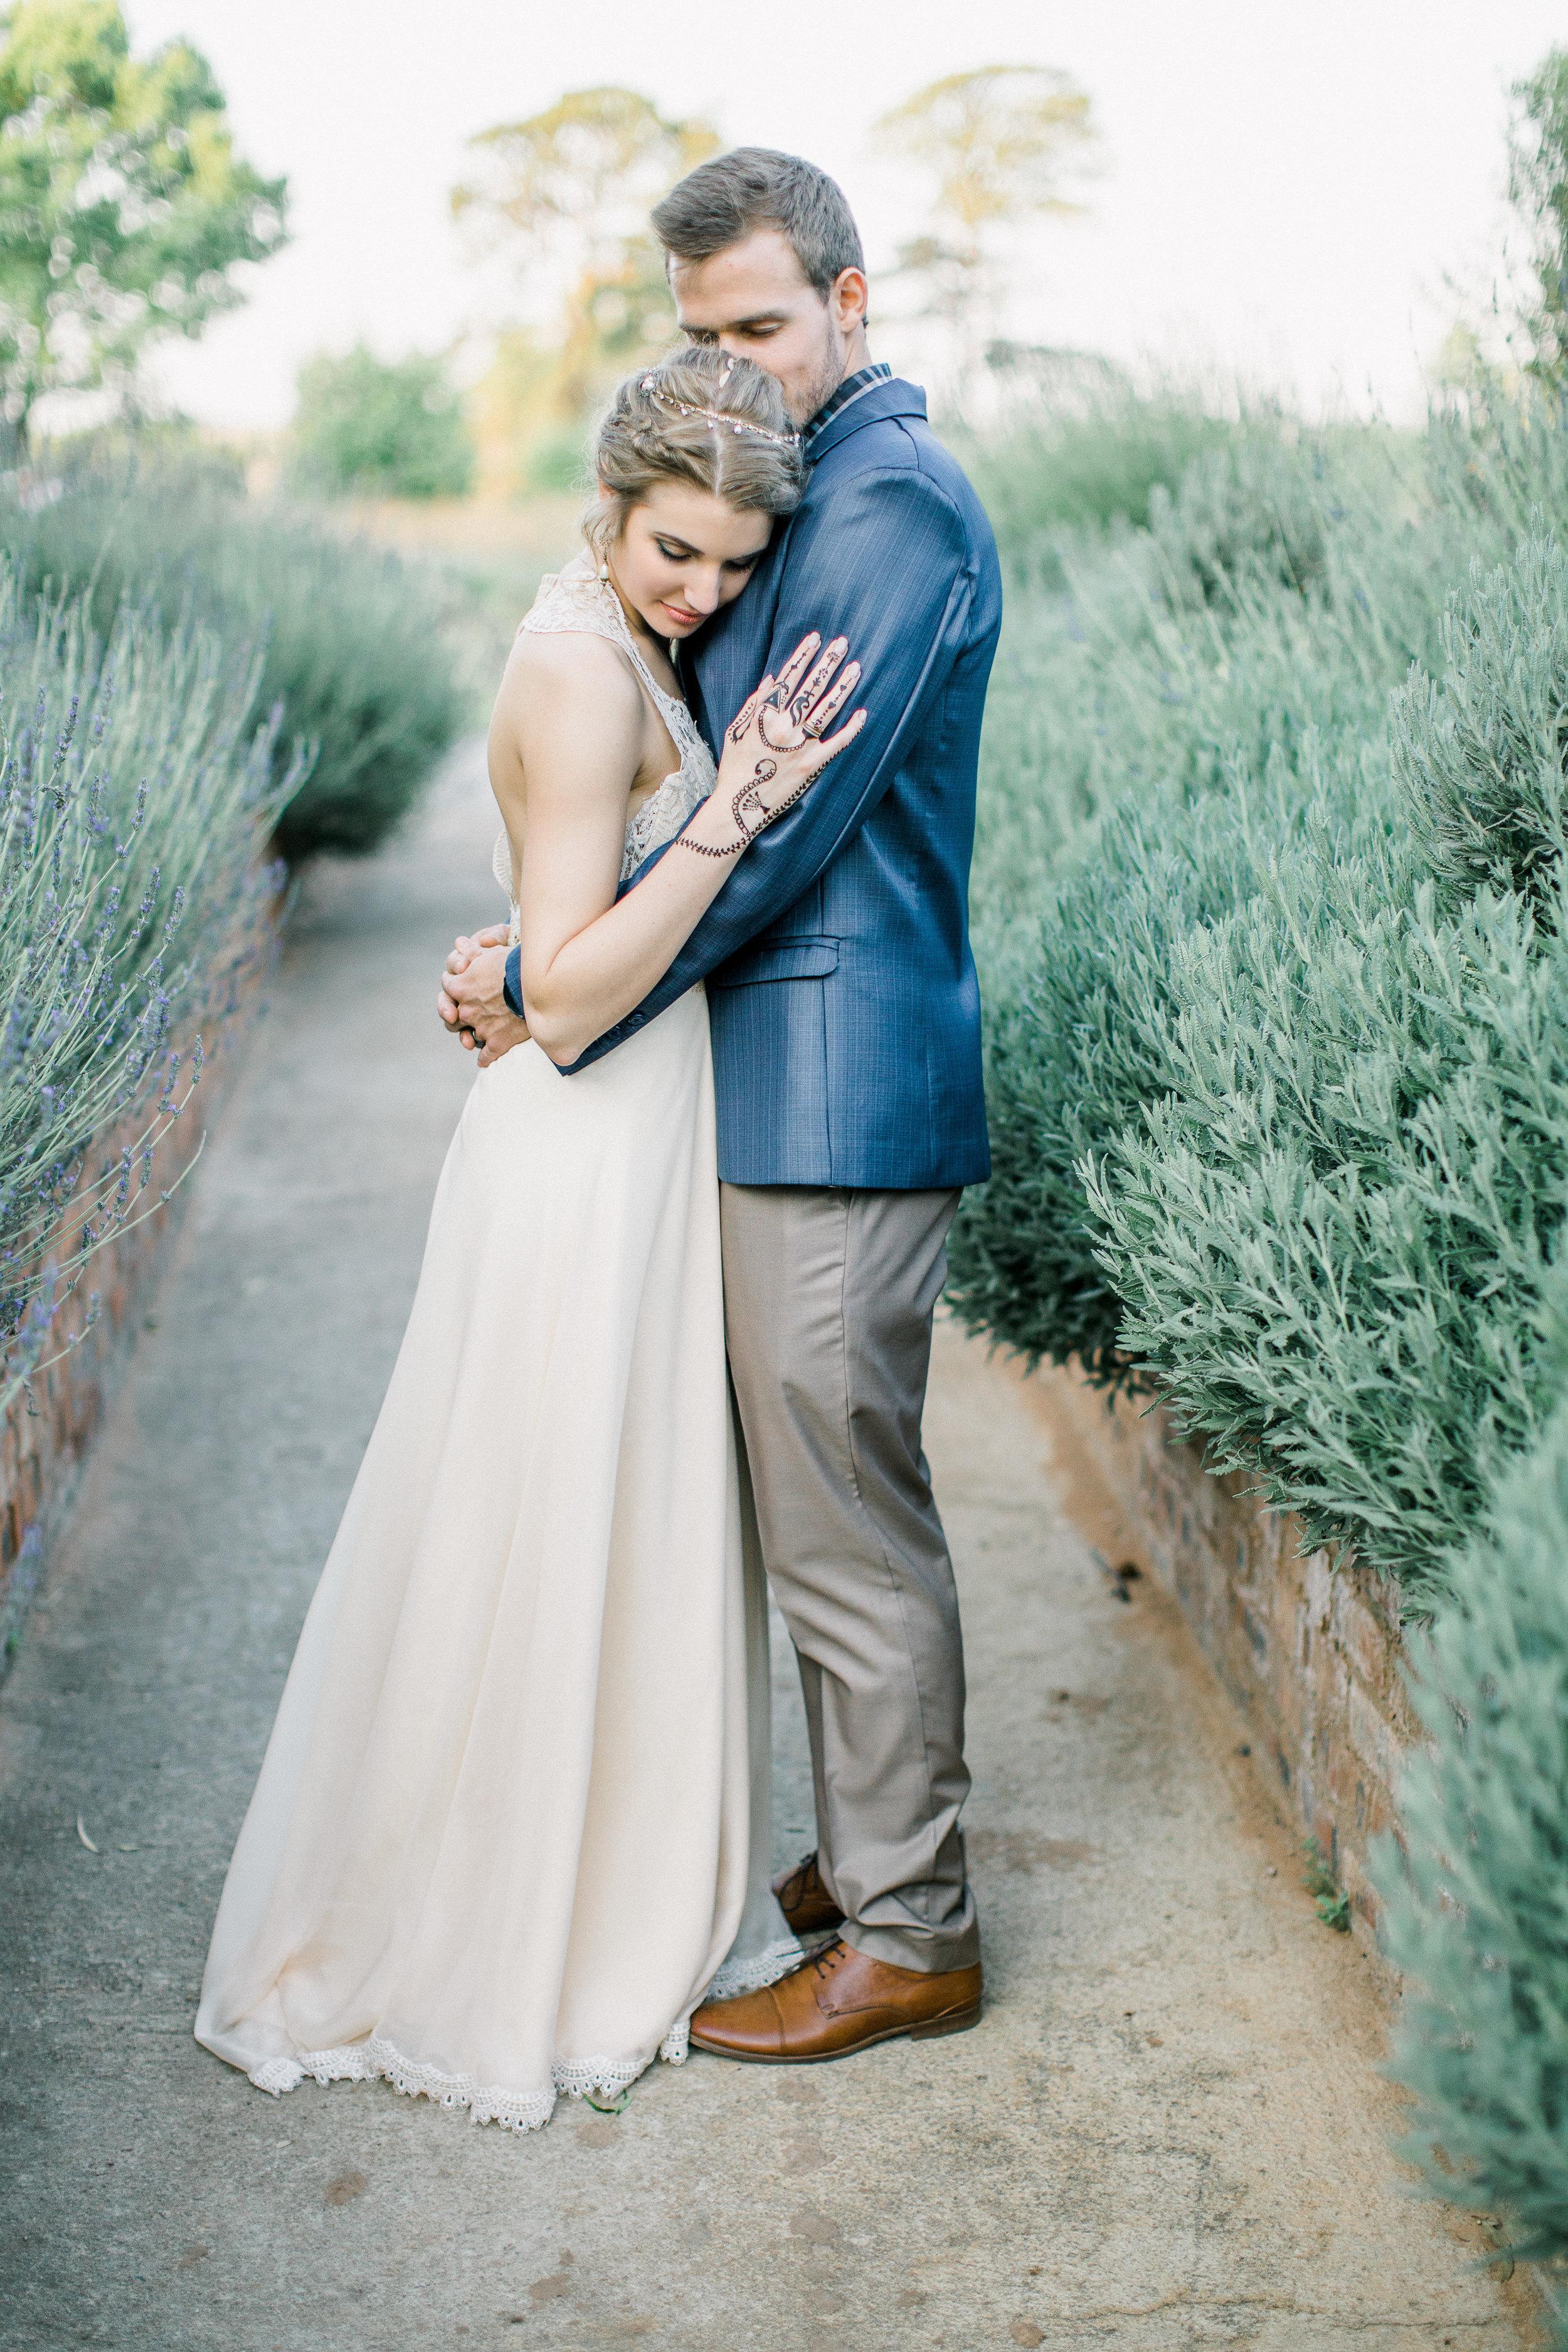 clareece smit south africa vintage boho wedding07.jpg